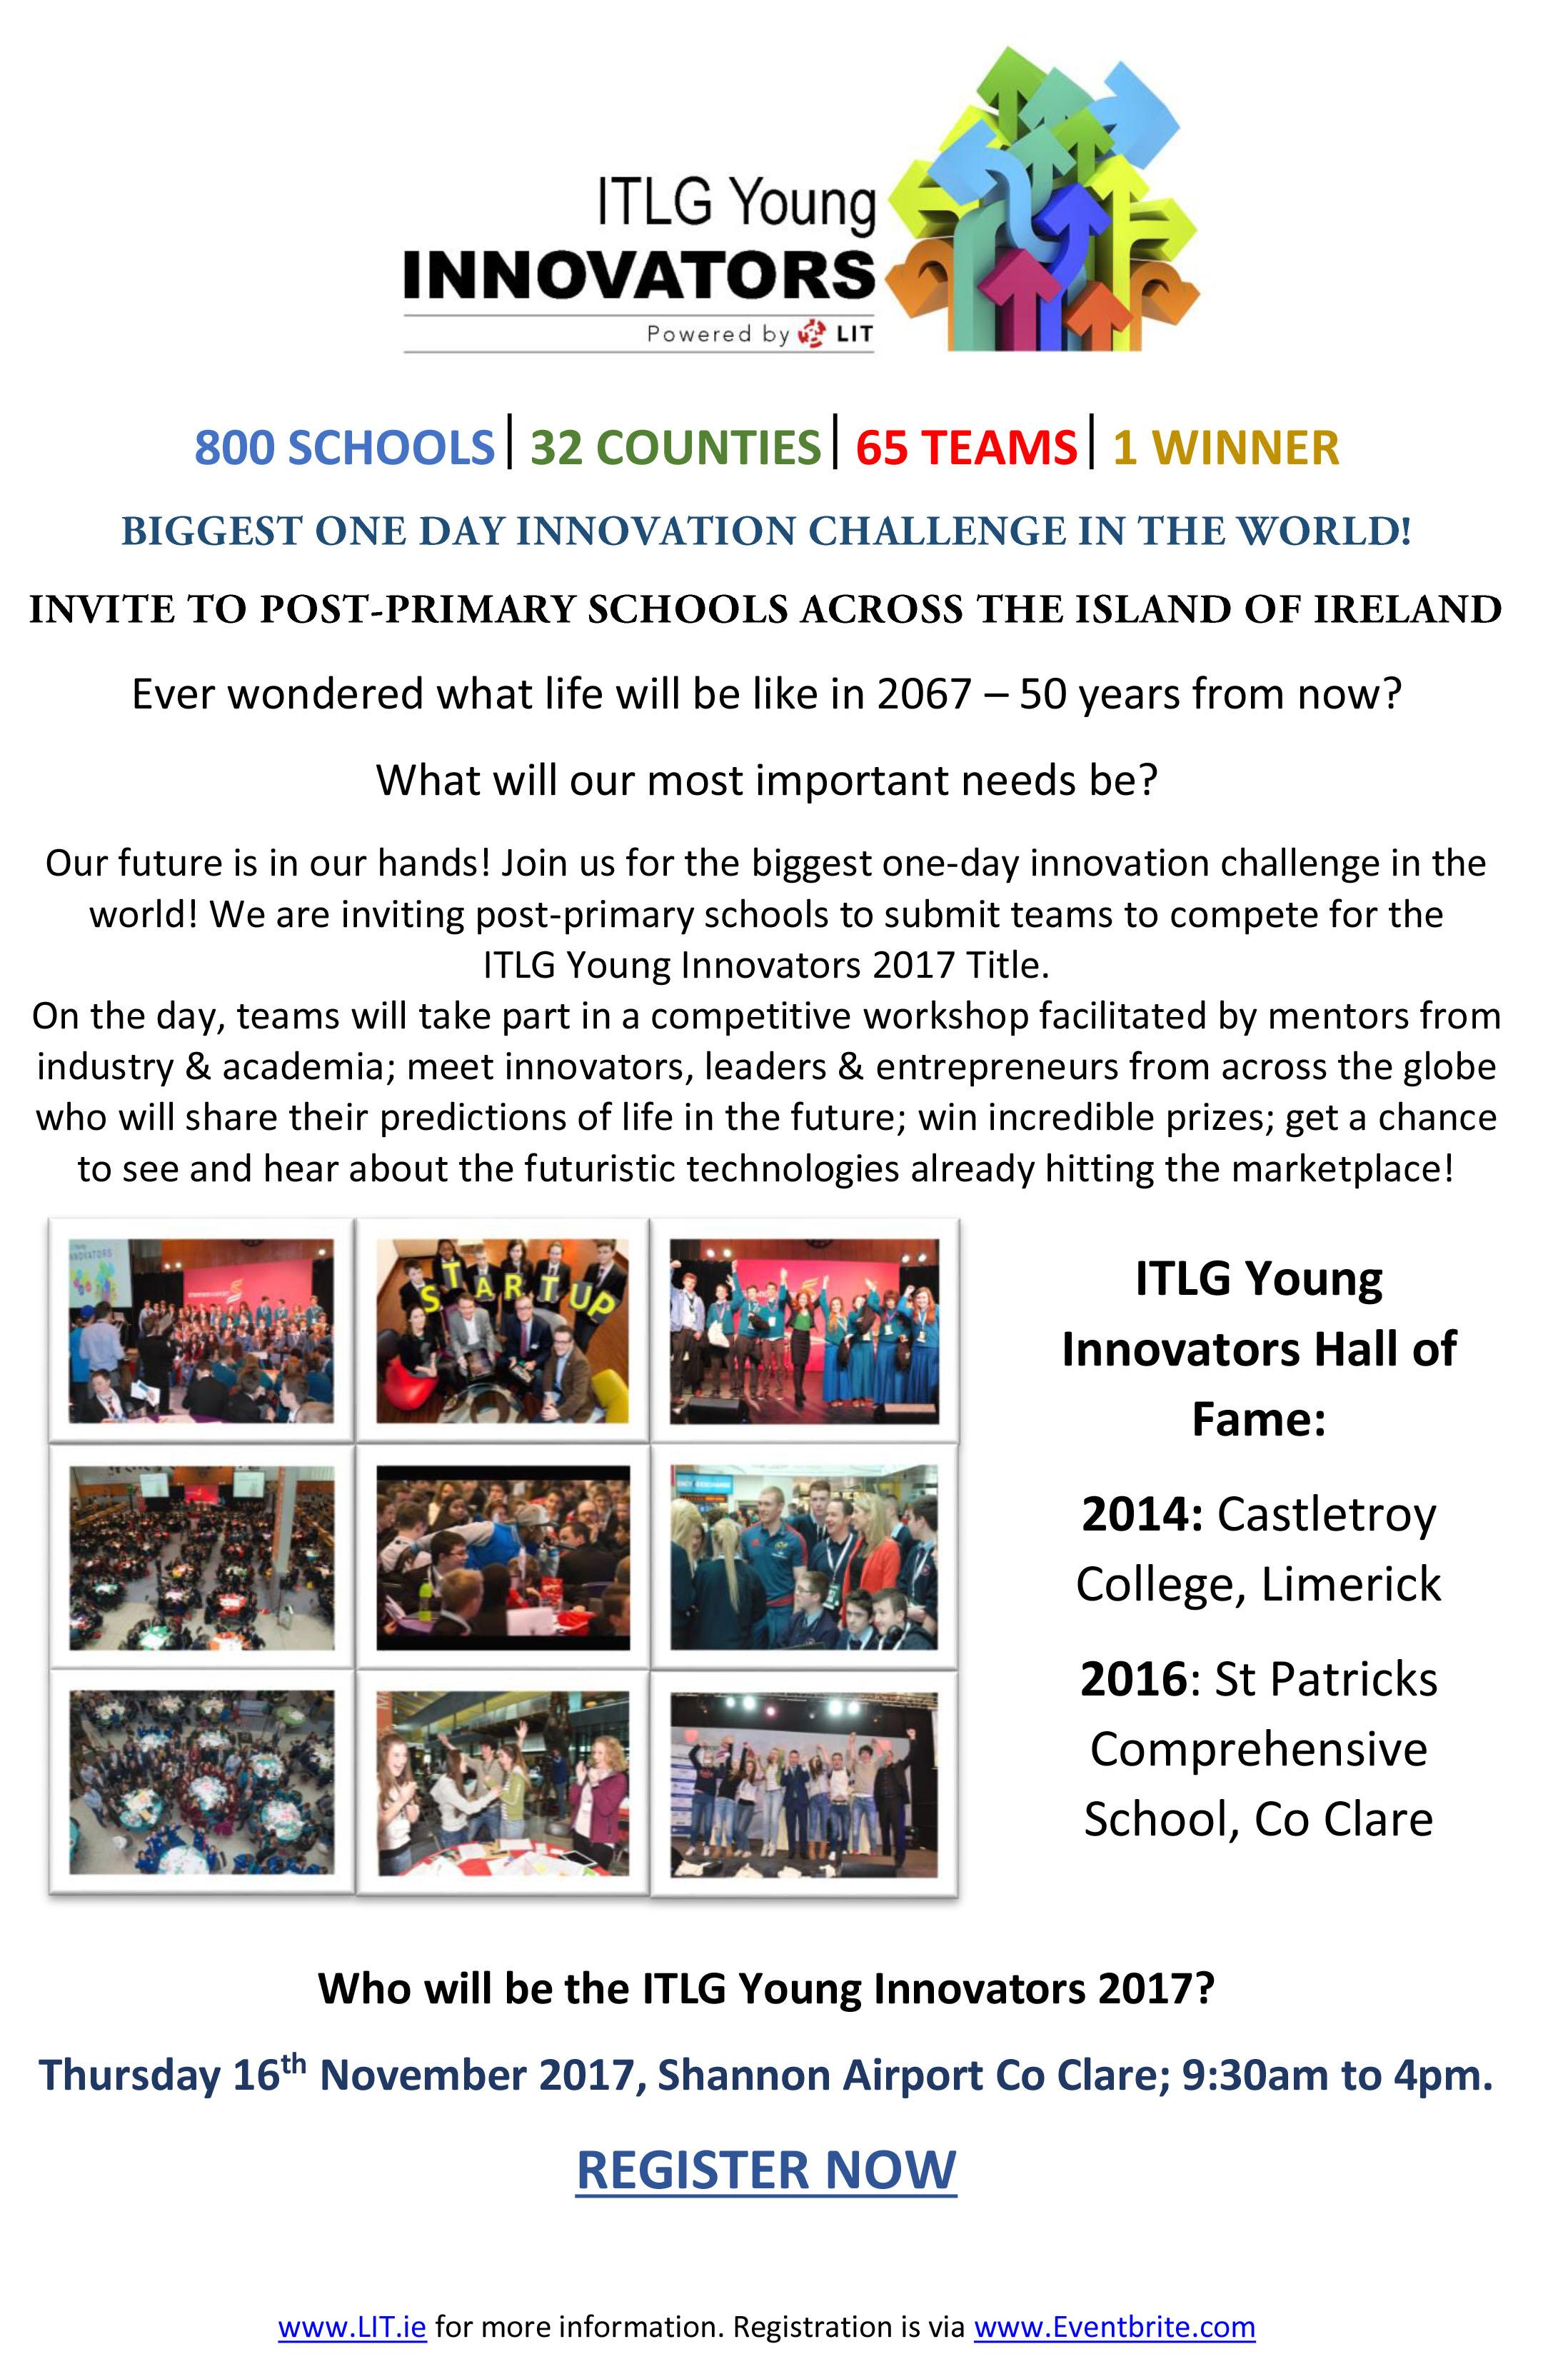 ITLG Young Innovators 2017